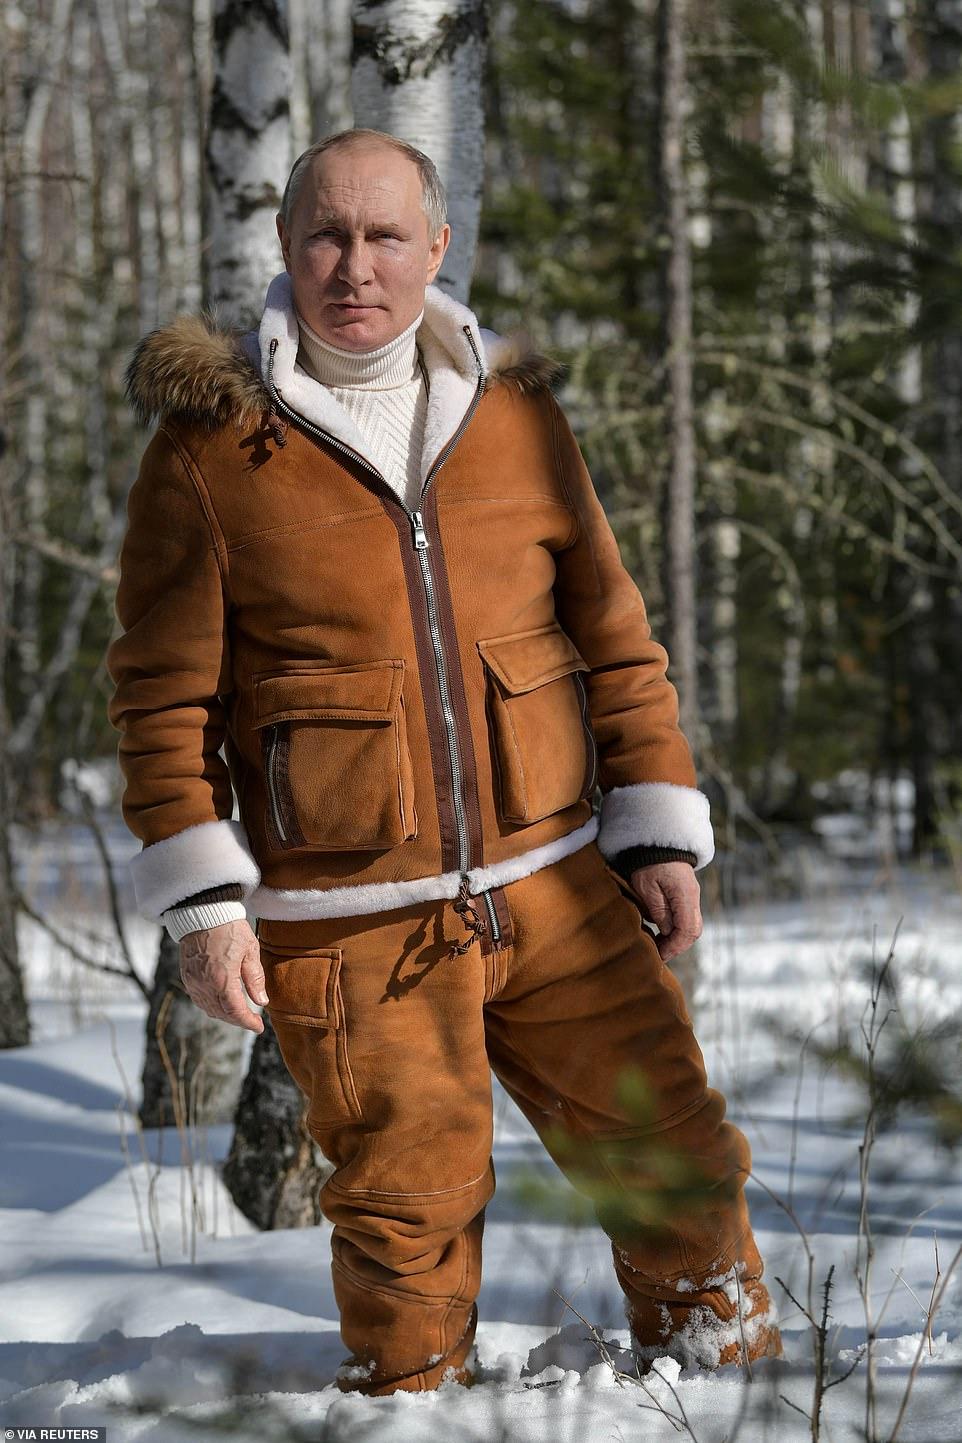 Russian President Vladimir Putin walks through snow during a holiday in the Siberian wilderness